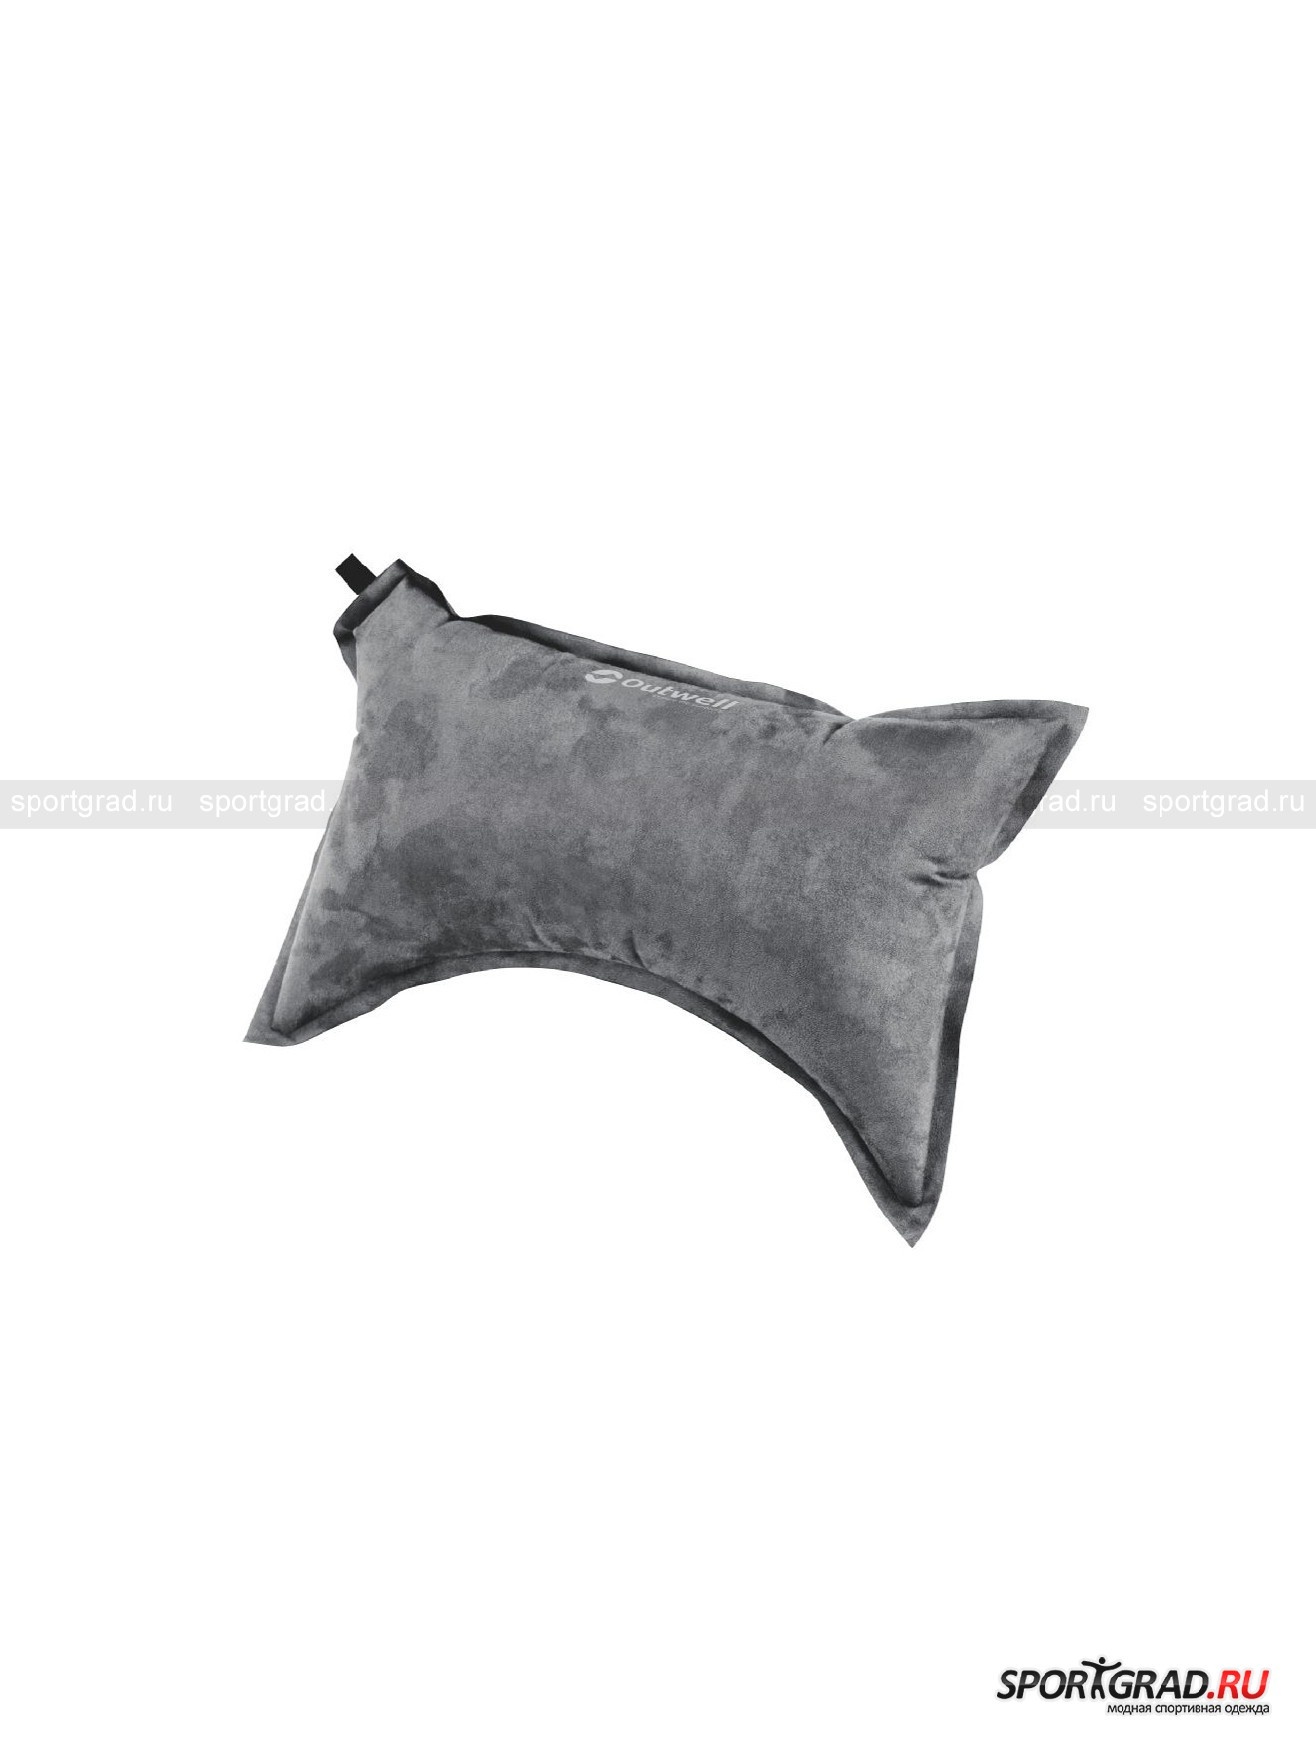 Надувная подушка Deepsleep Moon-shaped pillow Outwell